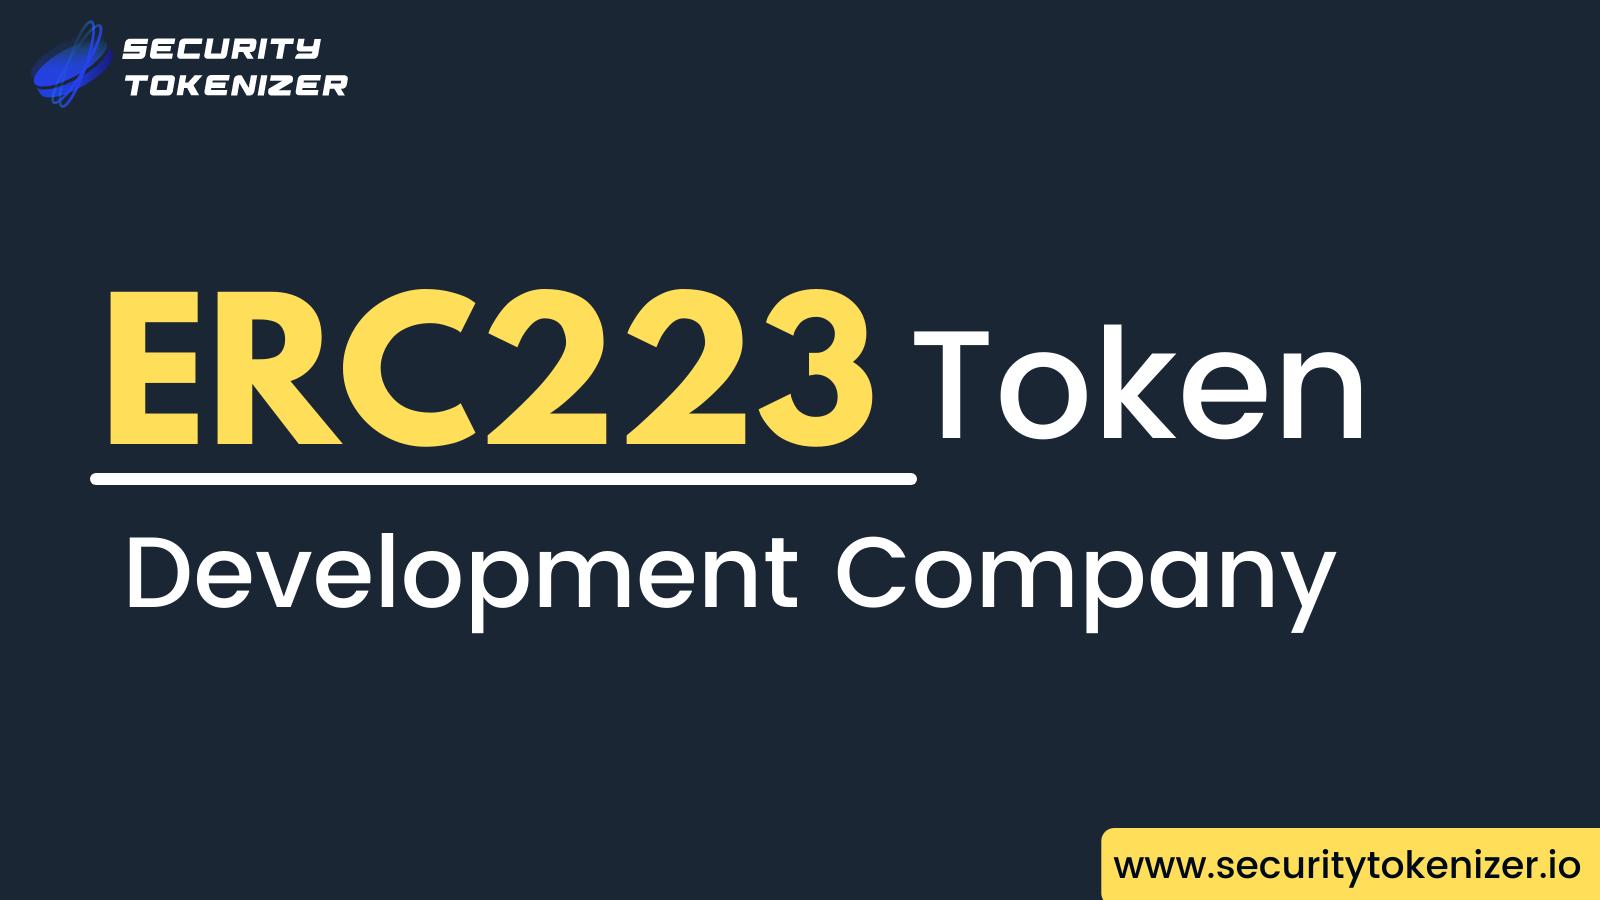 ERC223 Token Development Company